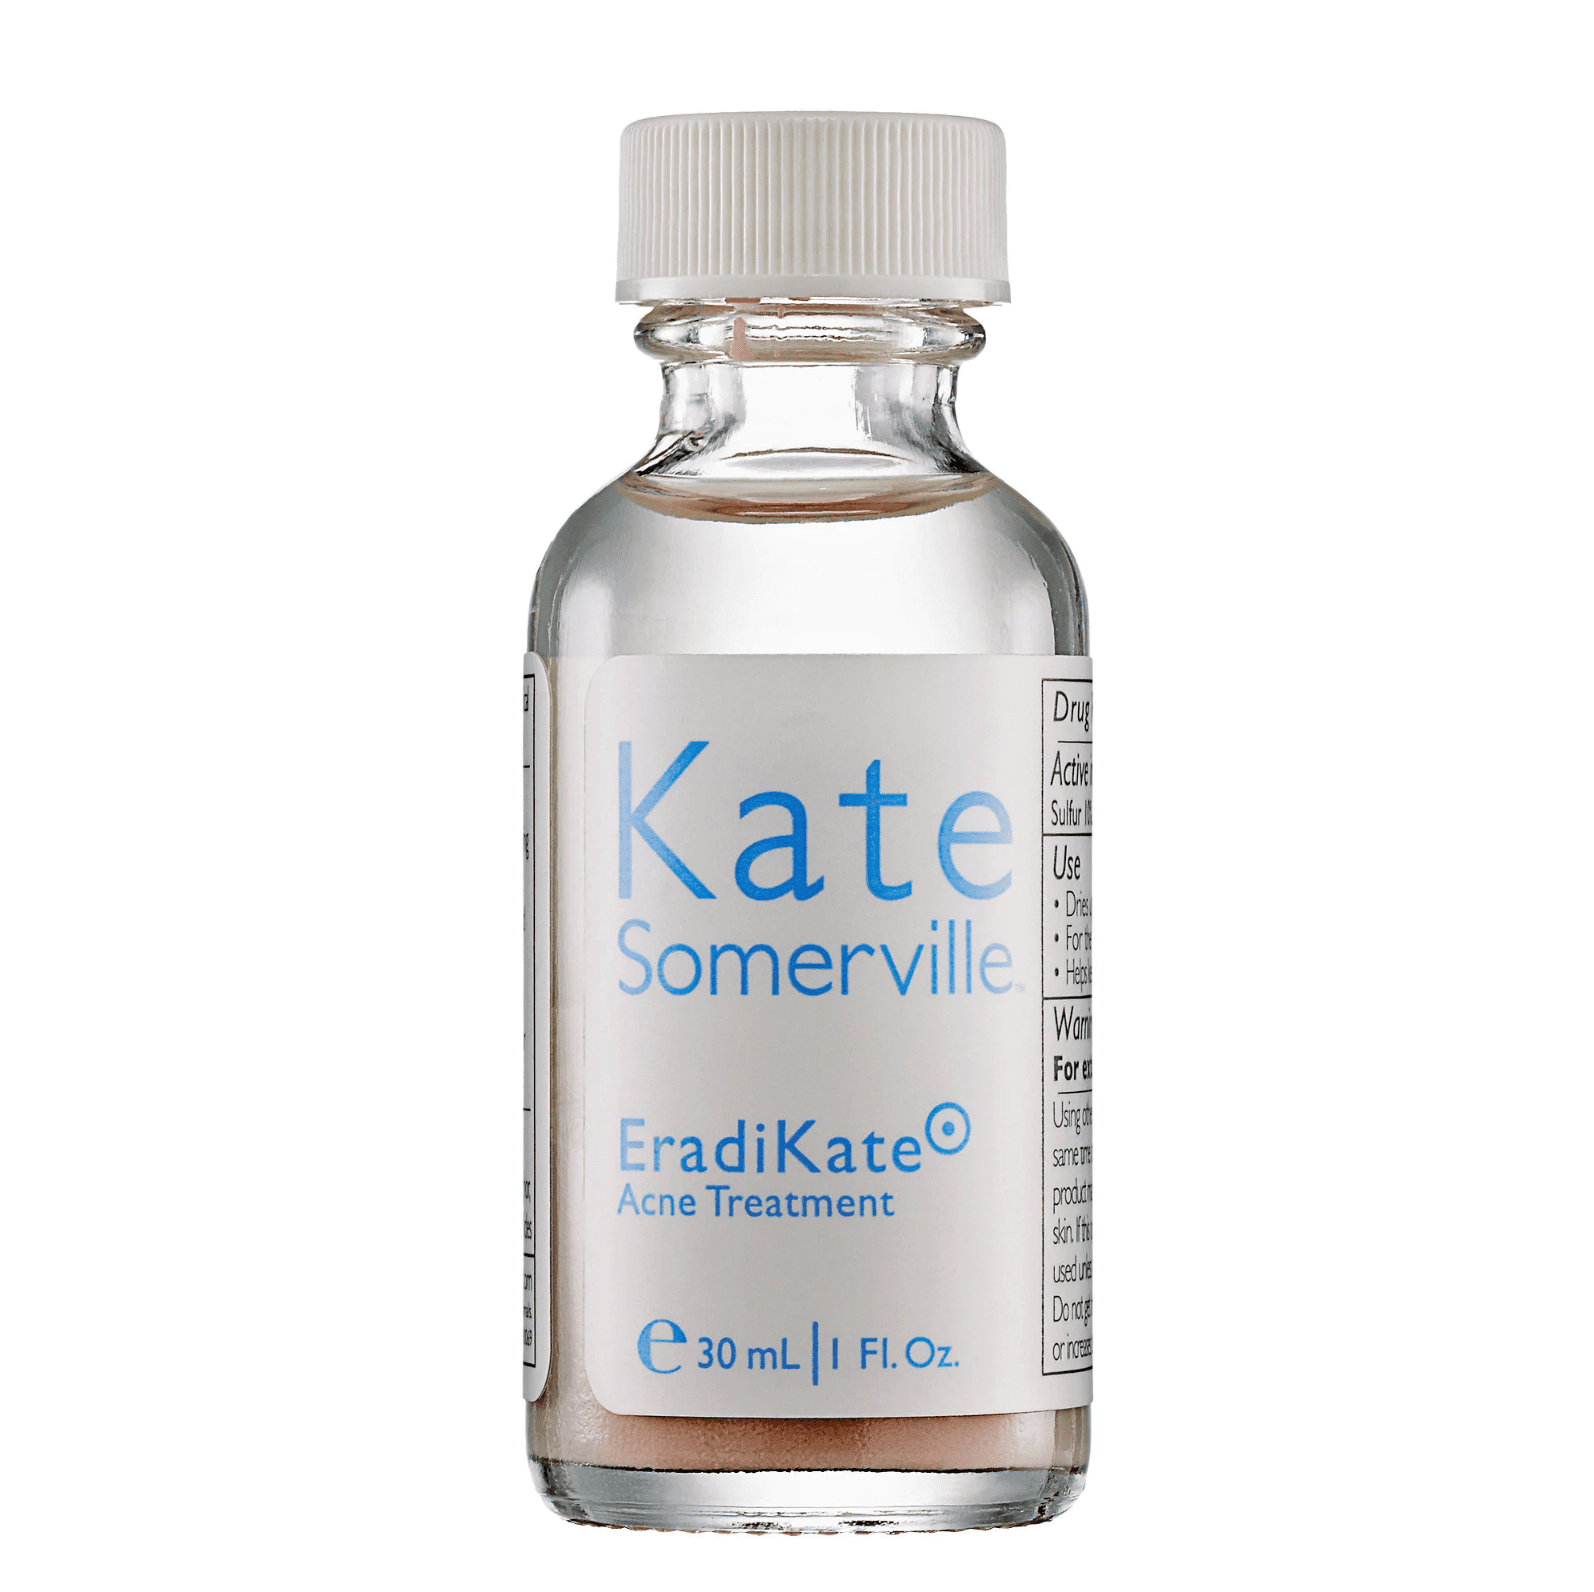 kate somerville acne treatment